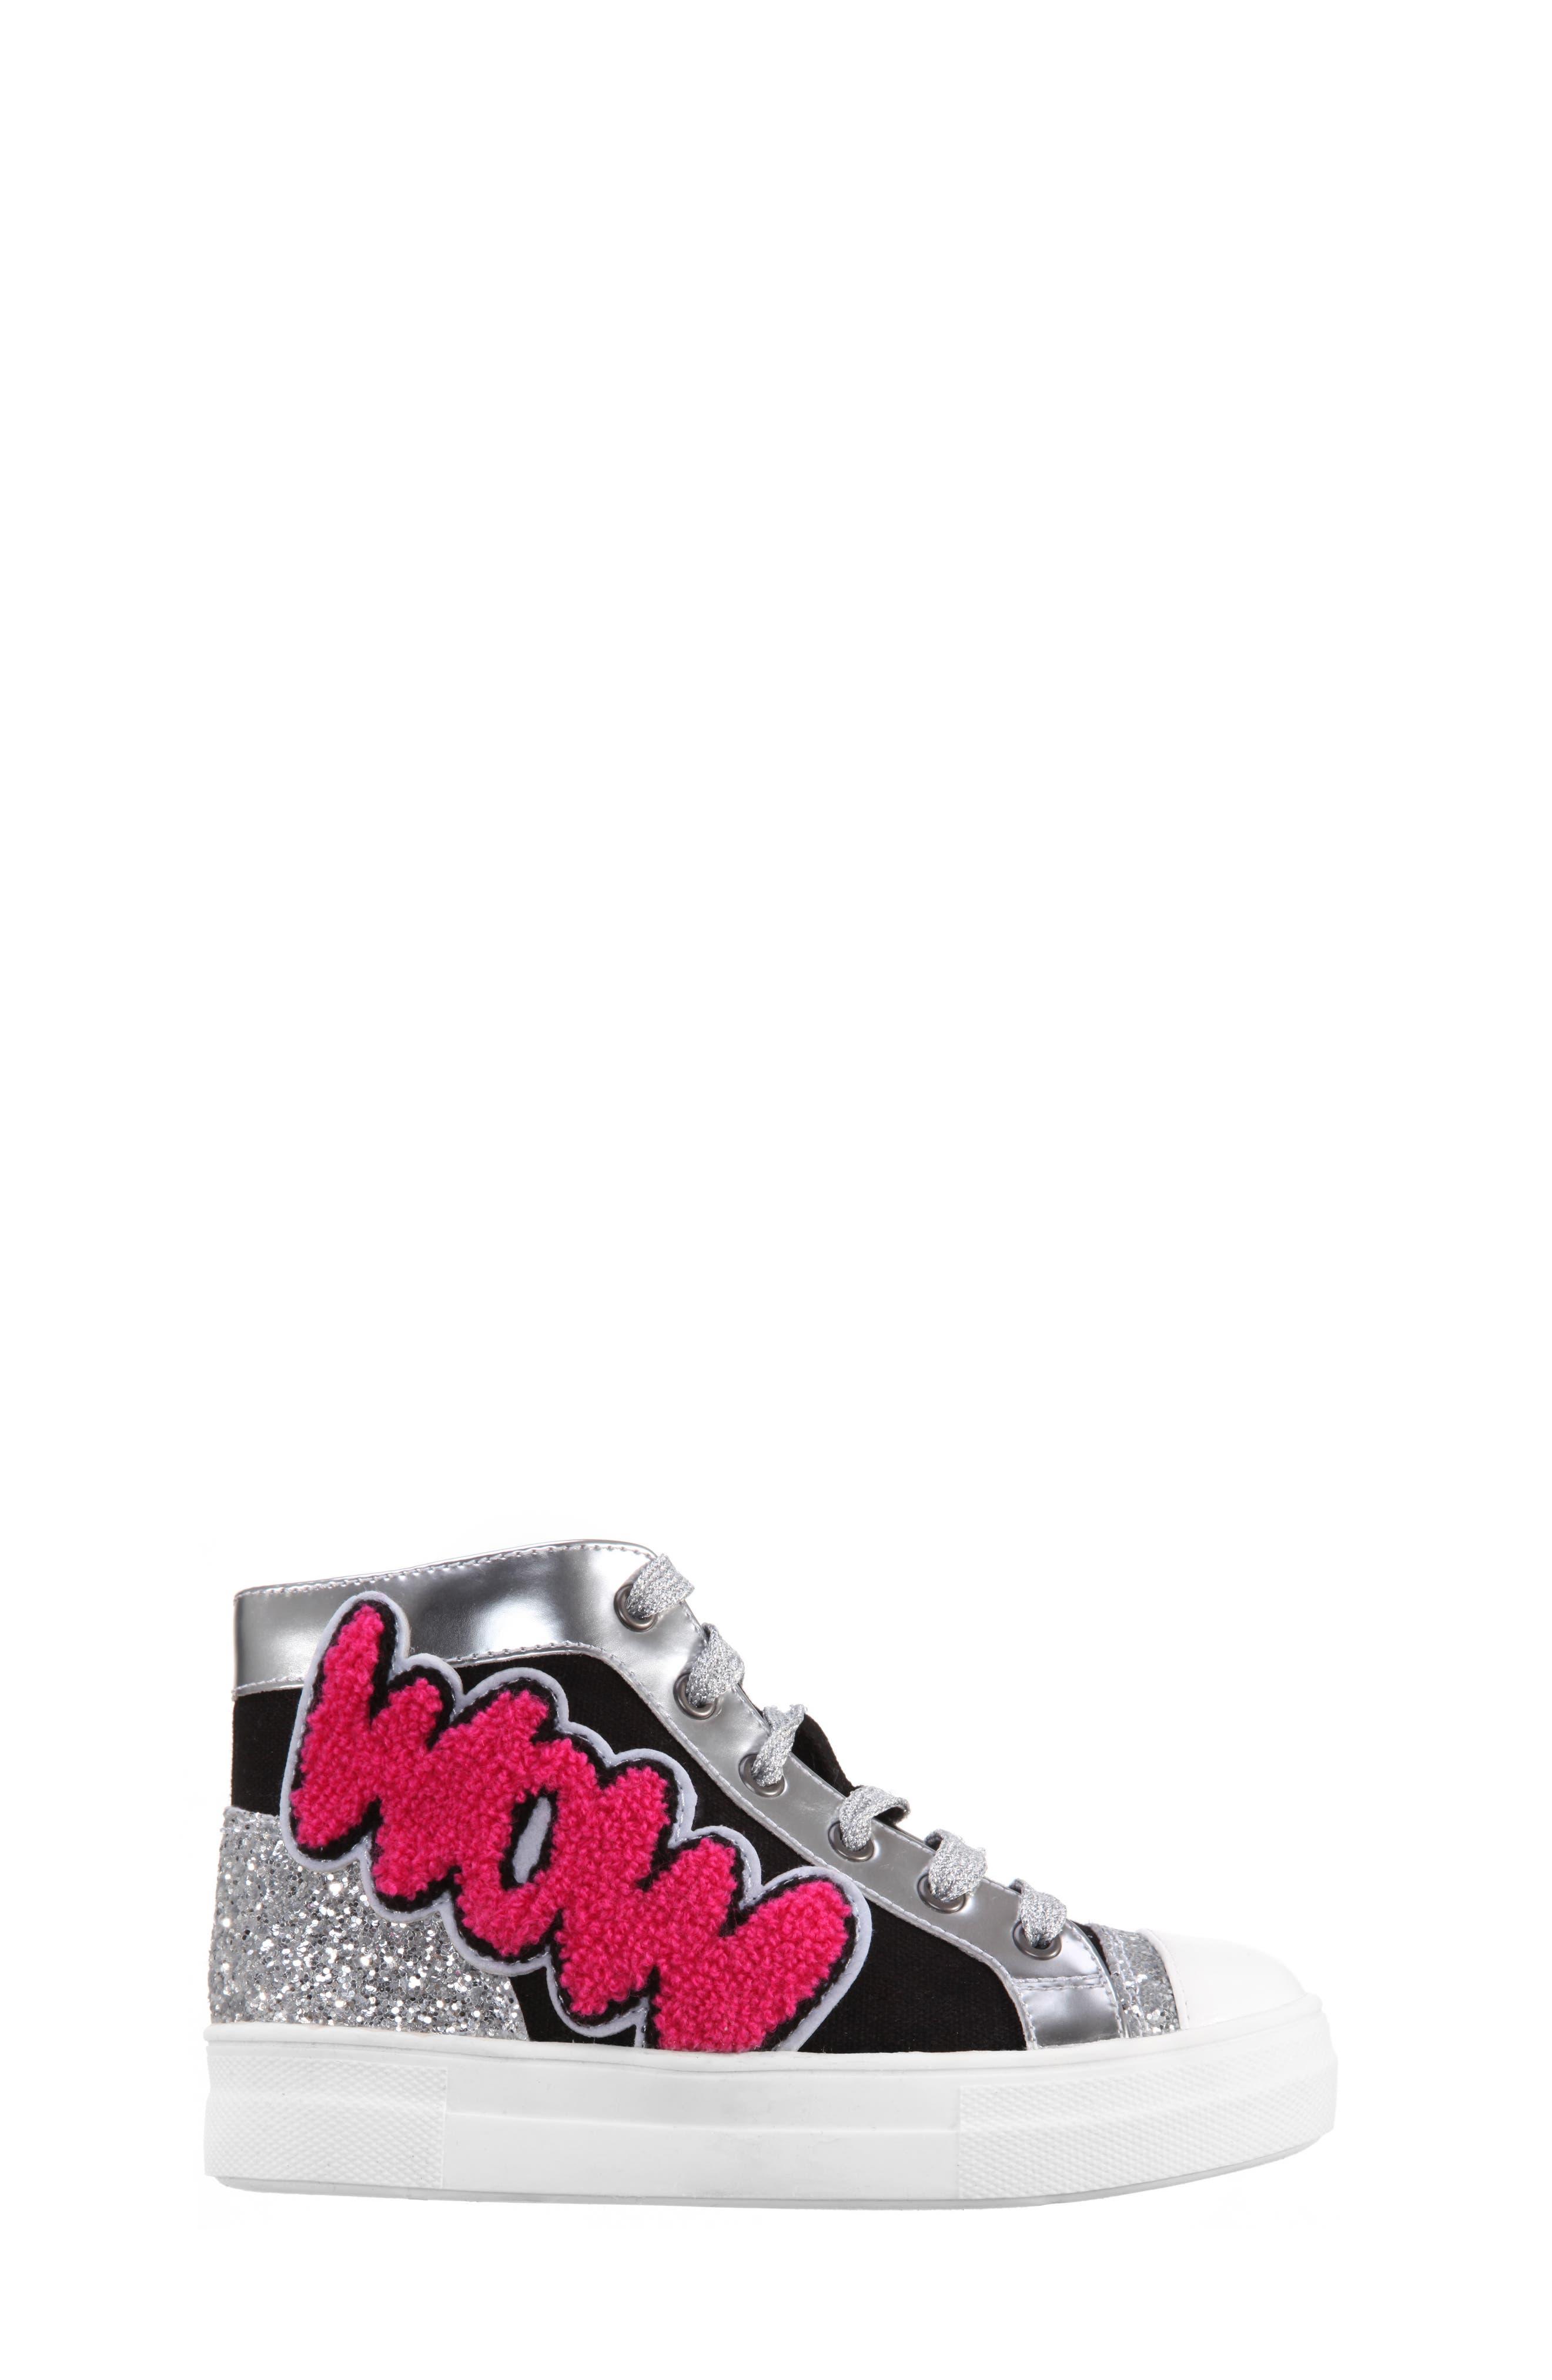 Gita High Top Sneaker,                             Alternate thumbnail 3, color,                             009